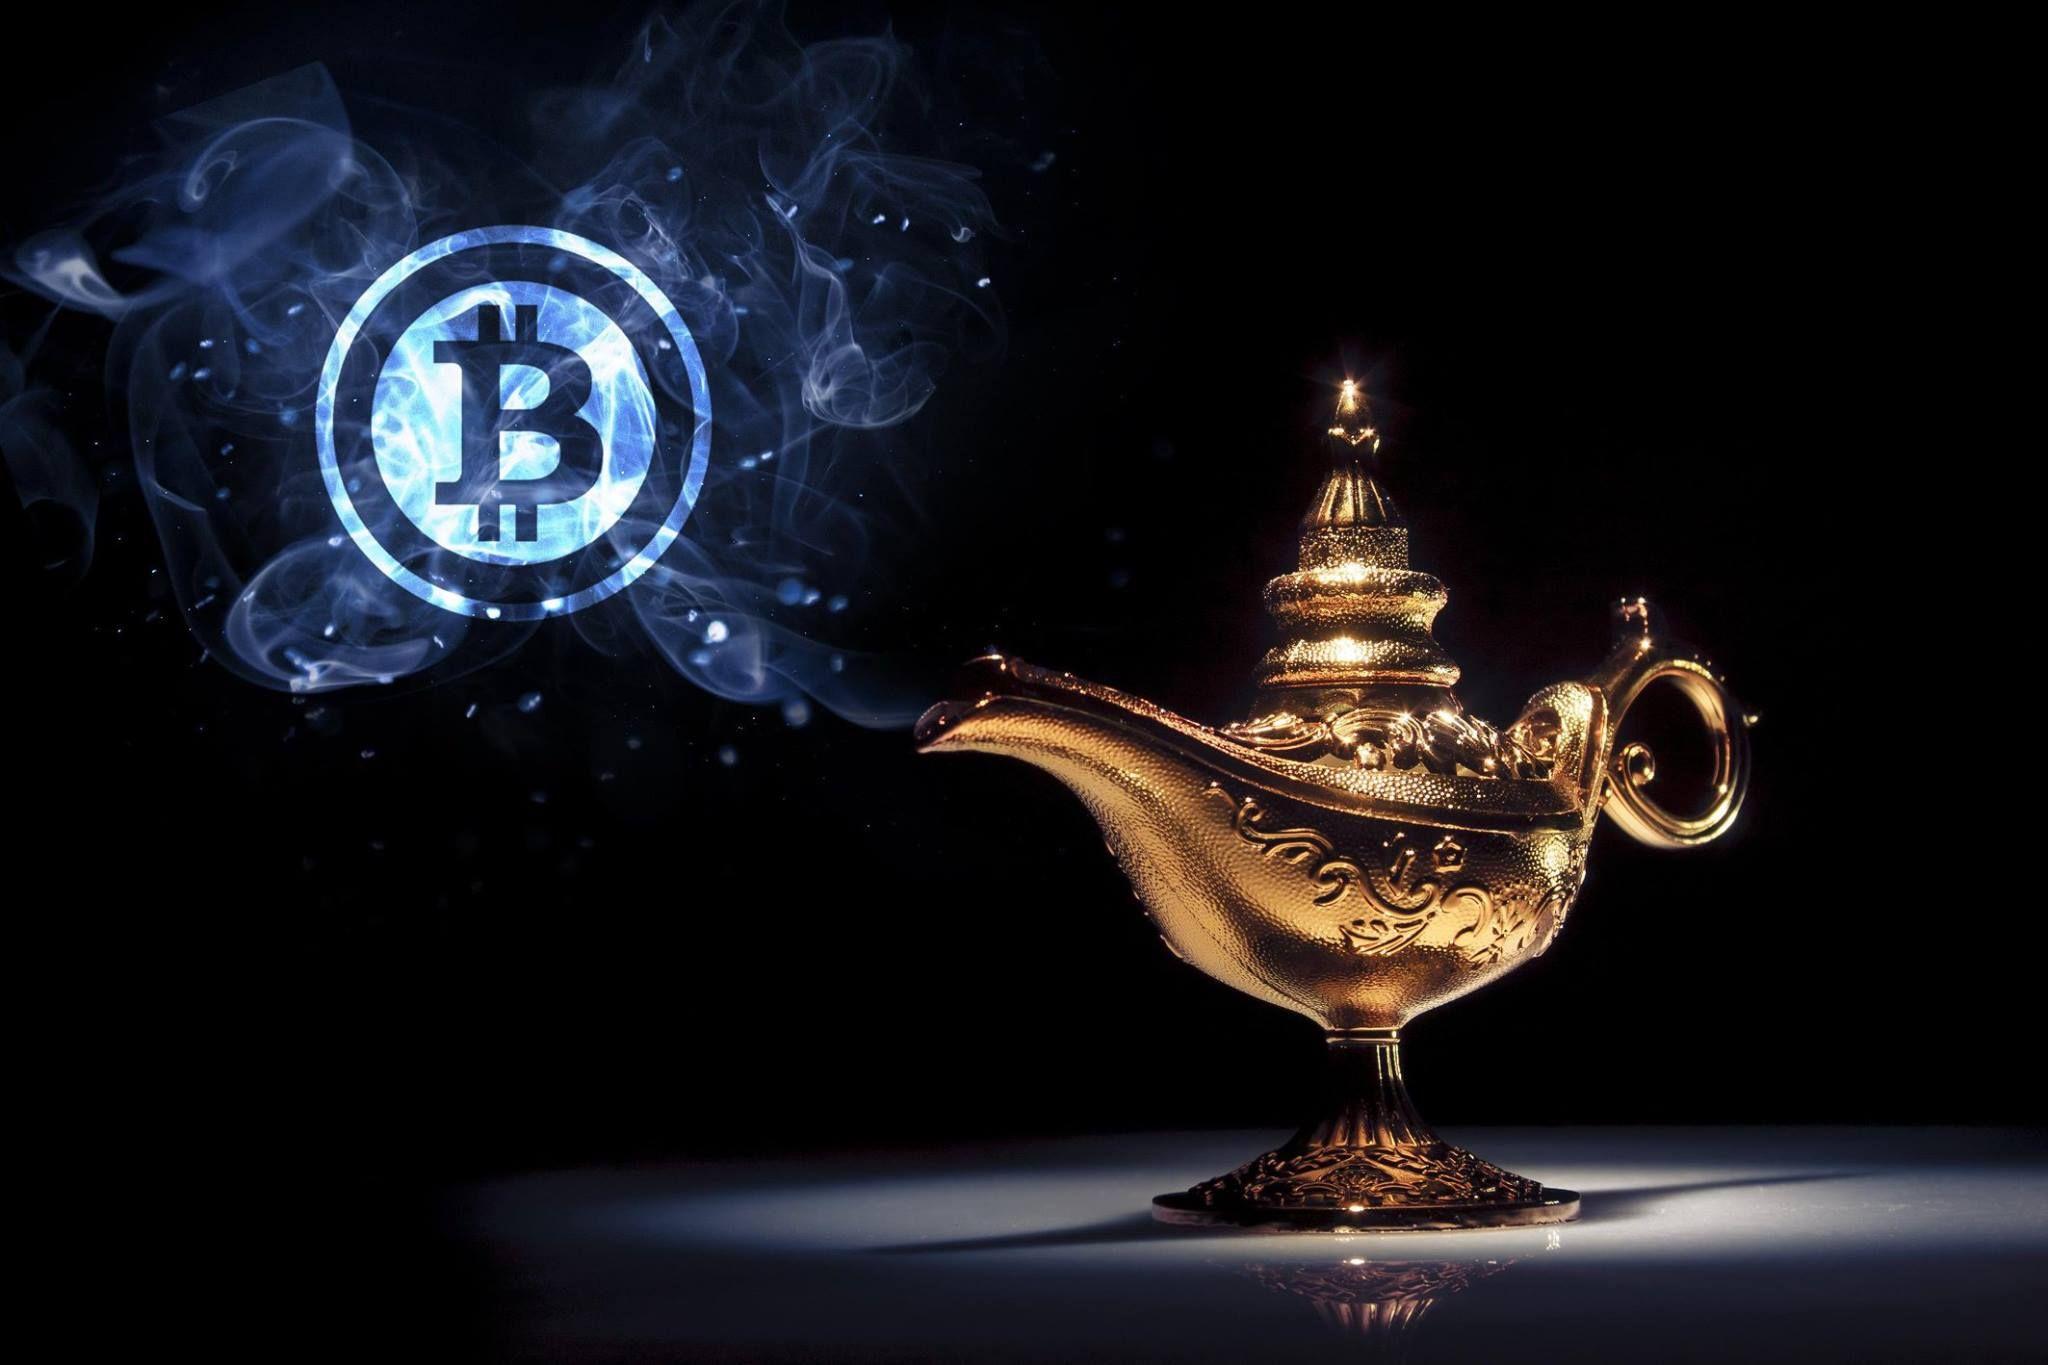 Pin by wael elnoiemi on cry pto Bitcoin price, Bitcoin